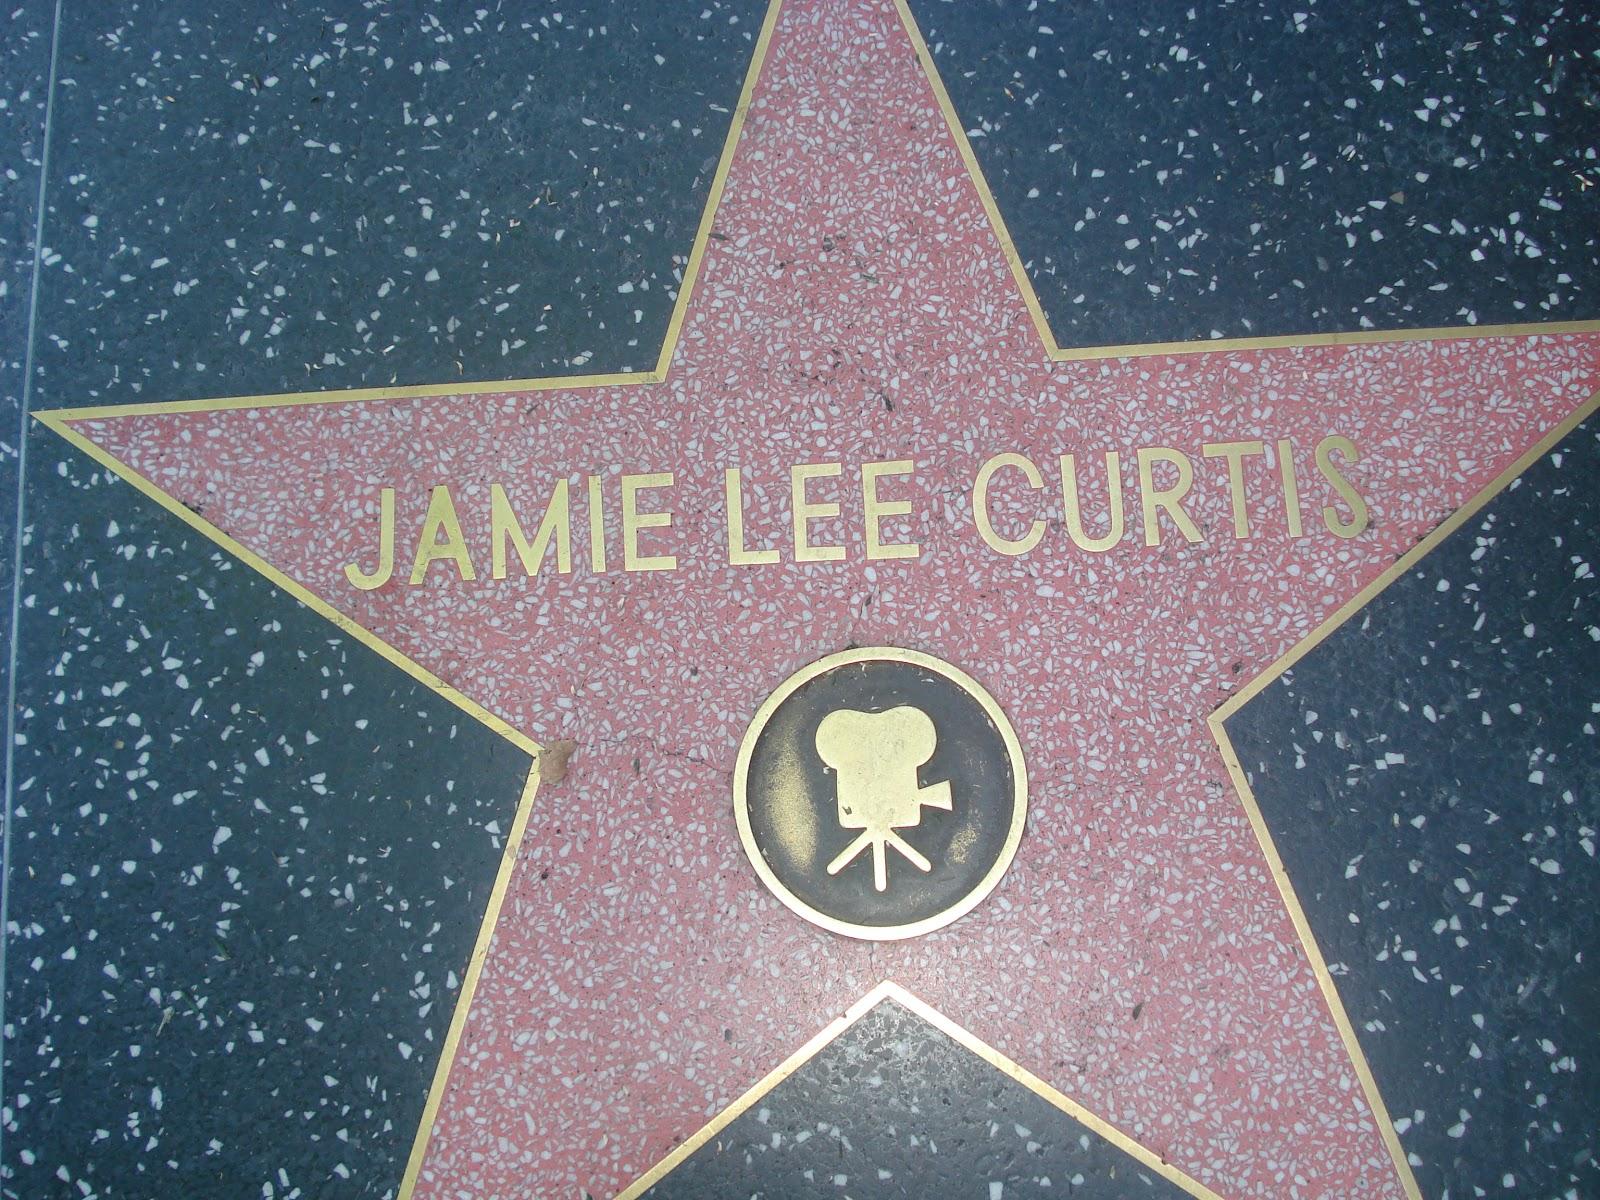 http://2.bp.blogspot.com/-x58sZ5vVJlQ/TmGoK8mISDI/AAAAAAAABPg/ubgeQ6dGtRM/s1600/Hollywood+stars+Jamie+Lee+Curtis.JPG